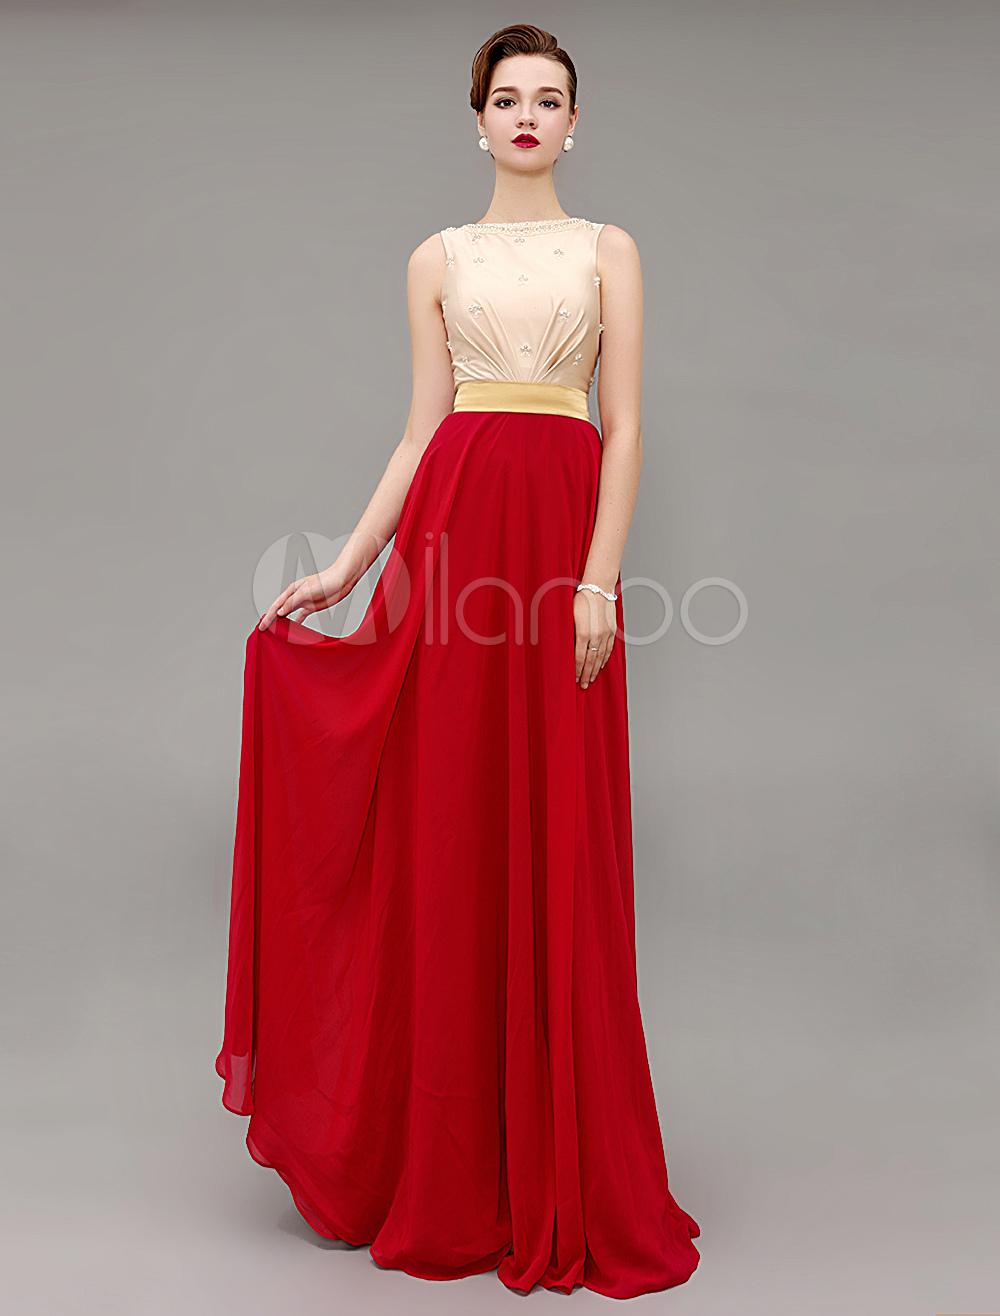 Red Prom Dresses 2018 Long Evening Dress Two Tone Bateau Beading Sash Party Dress (Wedding Evening Dresses) photo